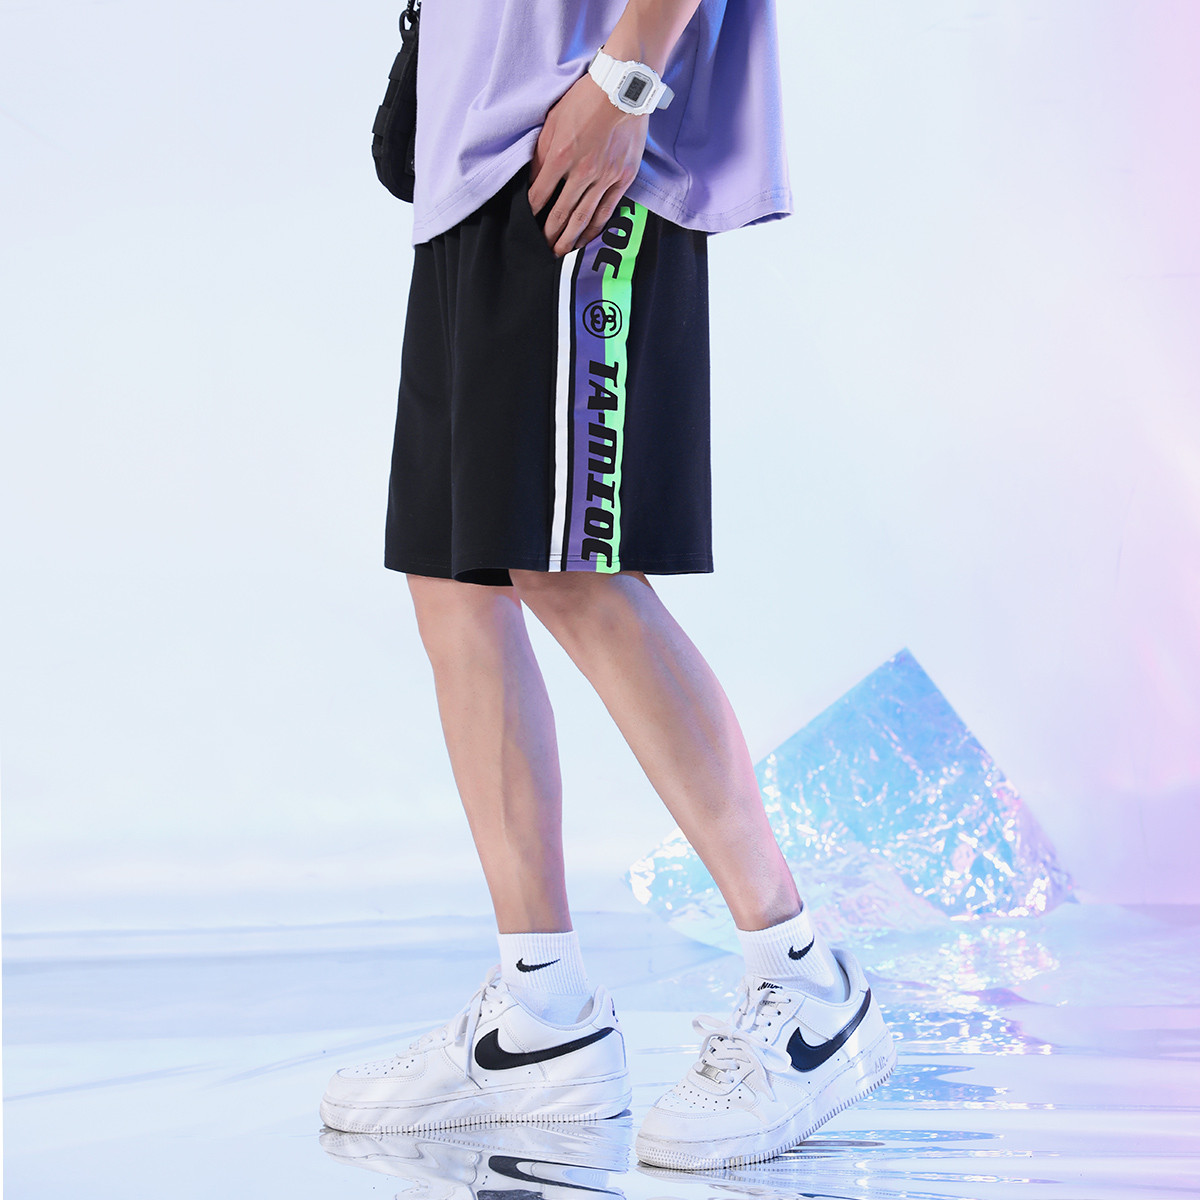 RAMPAGE RQ523301 情侣款荧光撞色印花针织五分短裤